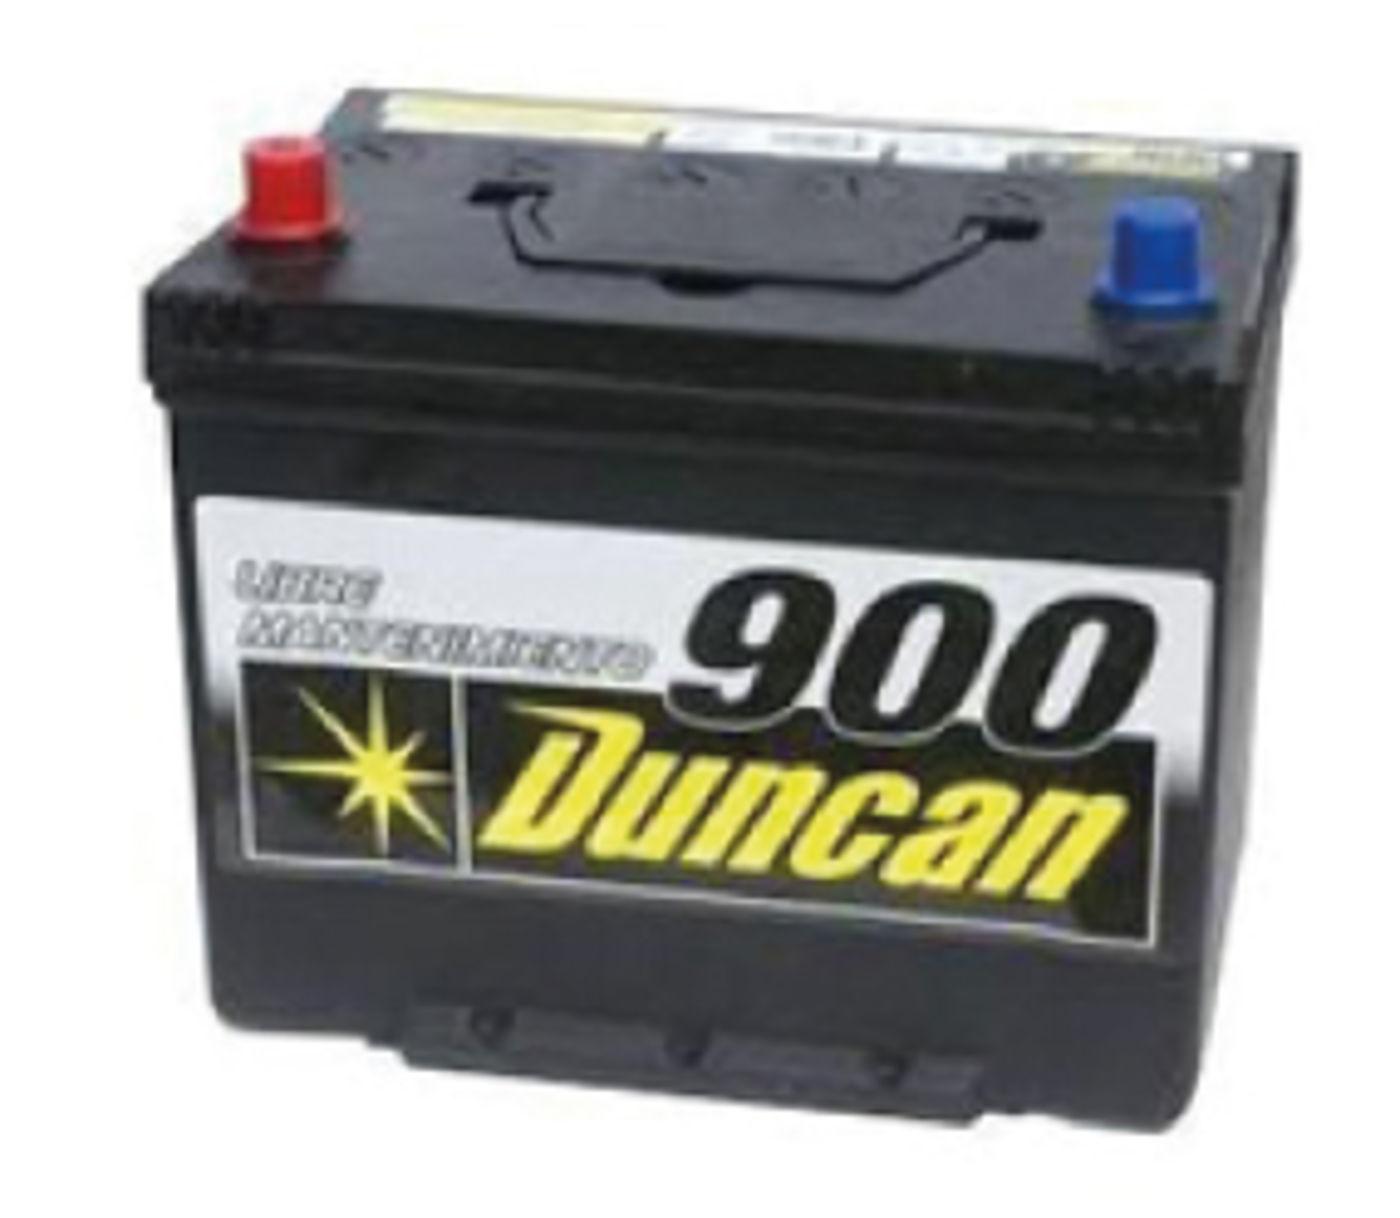 Duncan N40MR-600